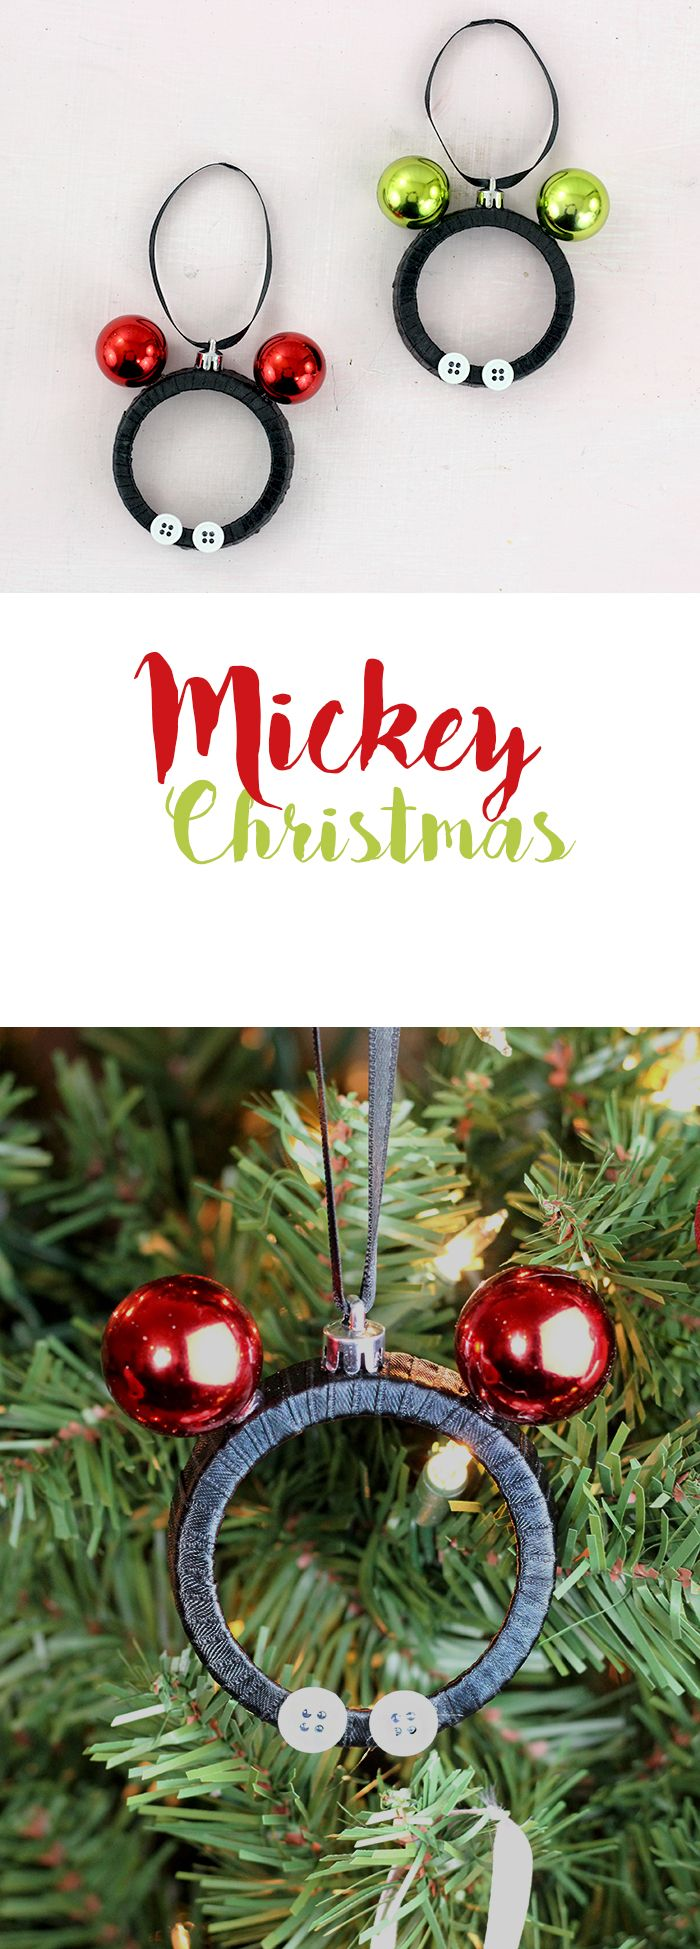 Cousin ornaments - Mickey And Minnie Diy Christmas Ornaments Make Them With Mason Jar Lids So Stinking